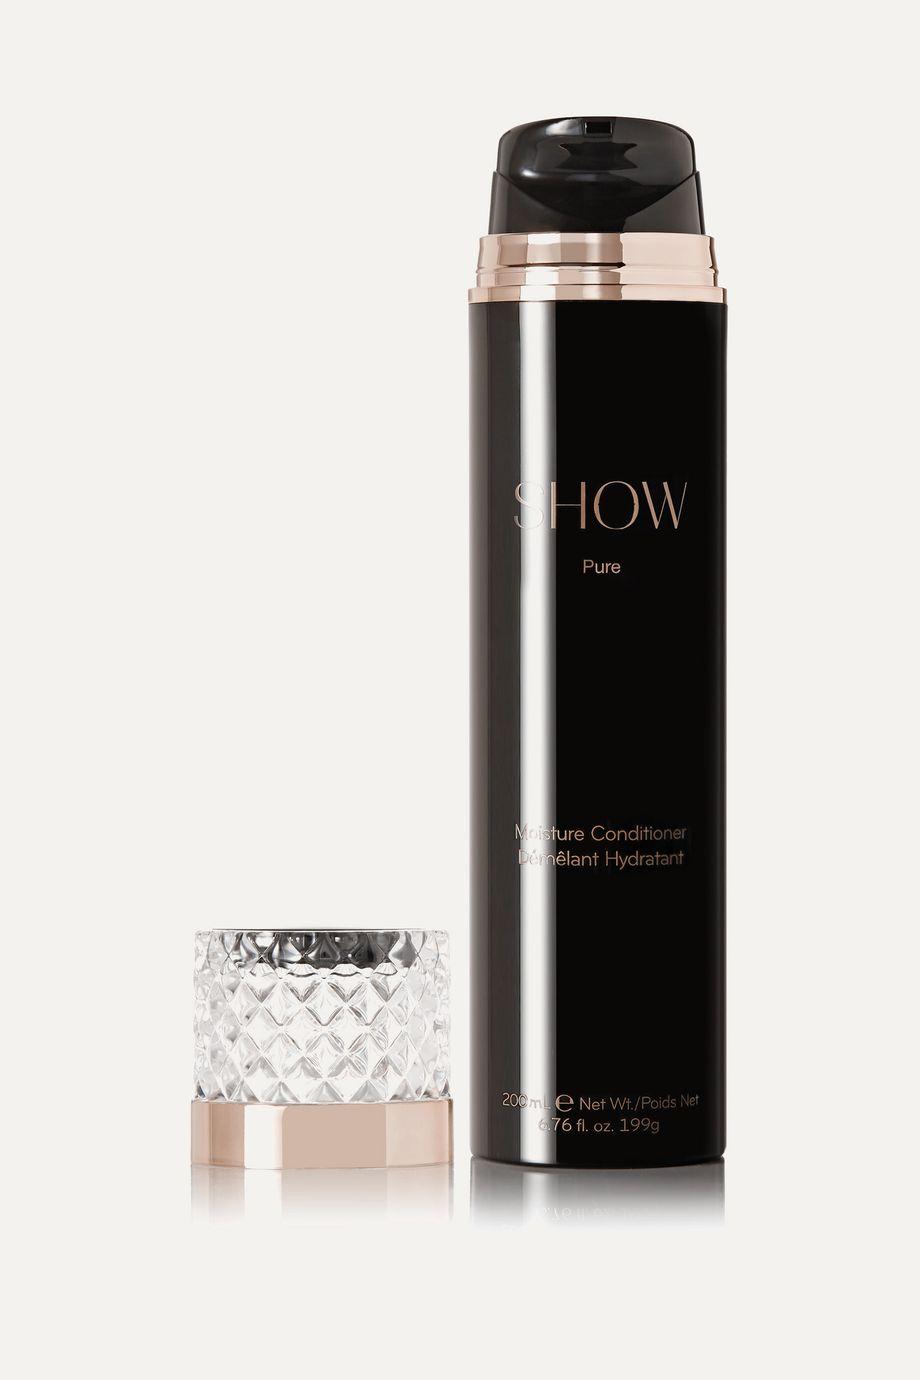 SHOW Beauty Pure Moisture Conditioner, 200ml